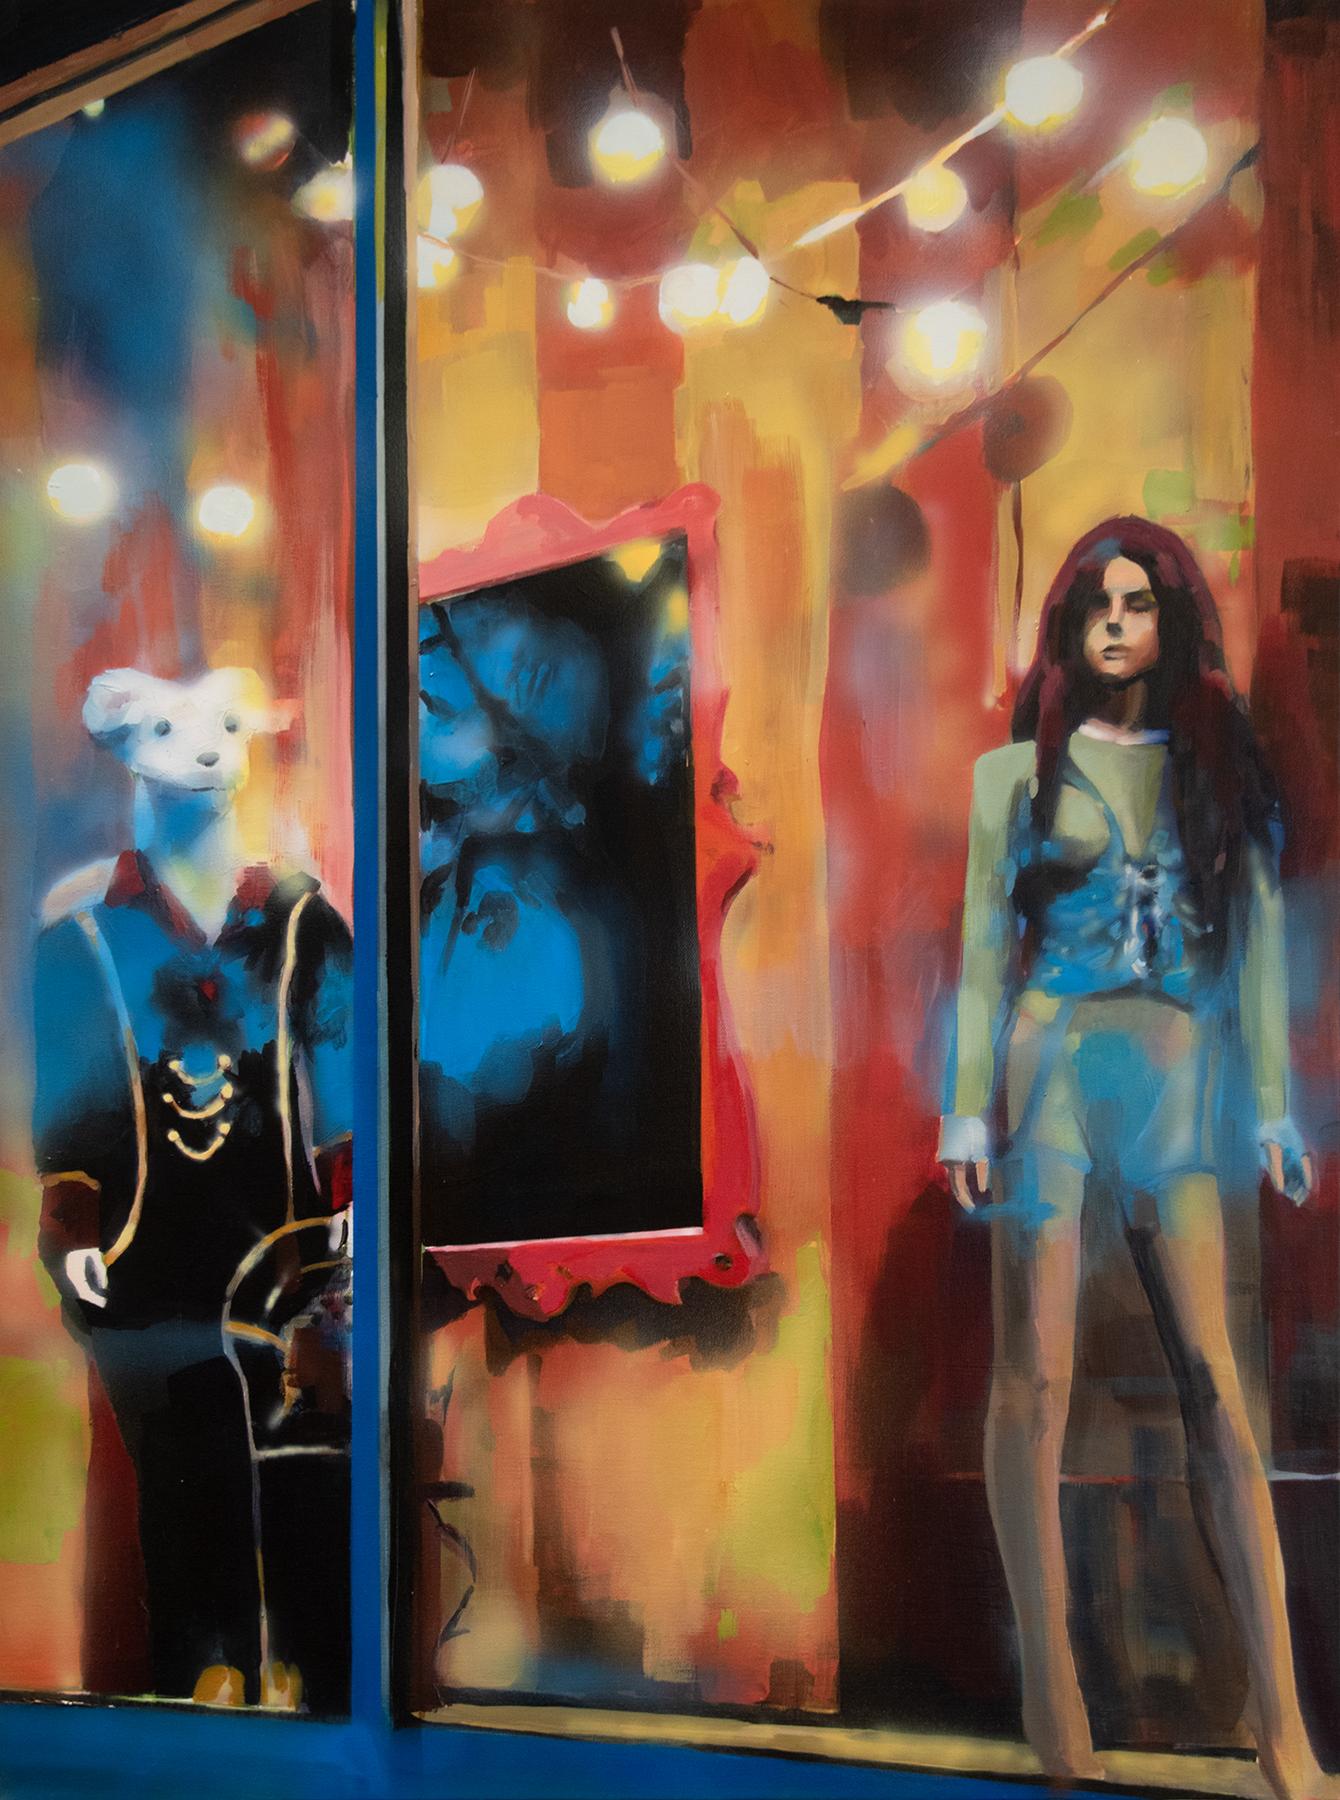 """Popcorn Included"", Alyssa Hood, 2019, acrylic on canvas, 40 x 30 in."